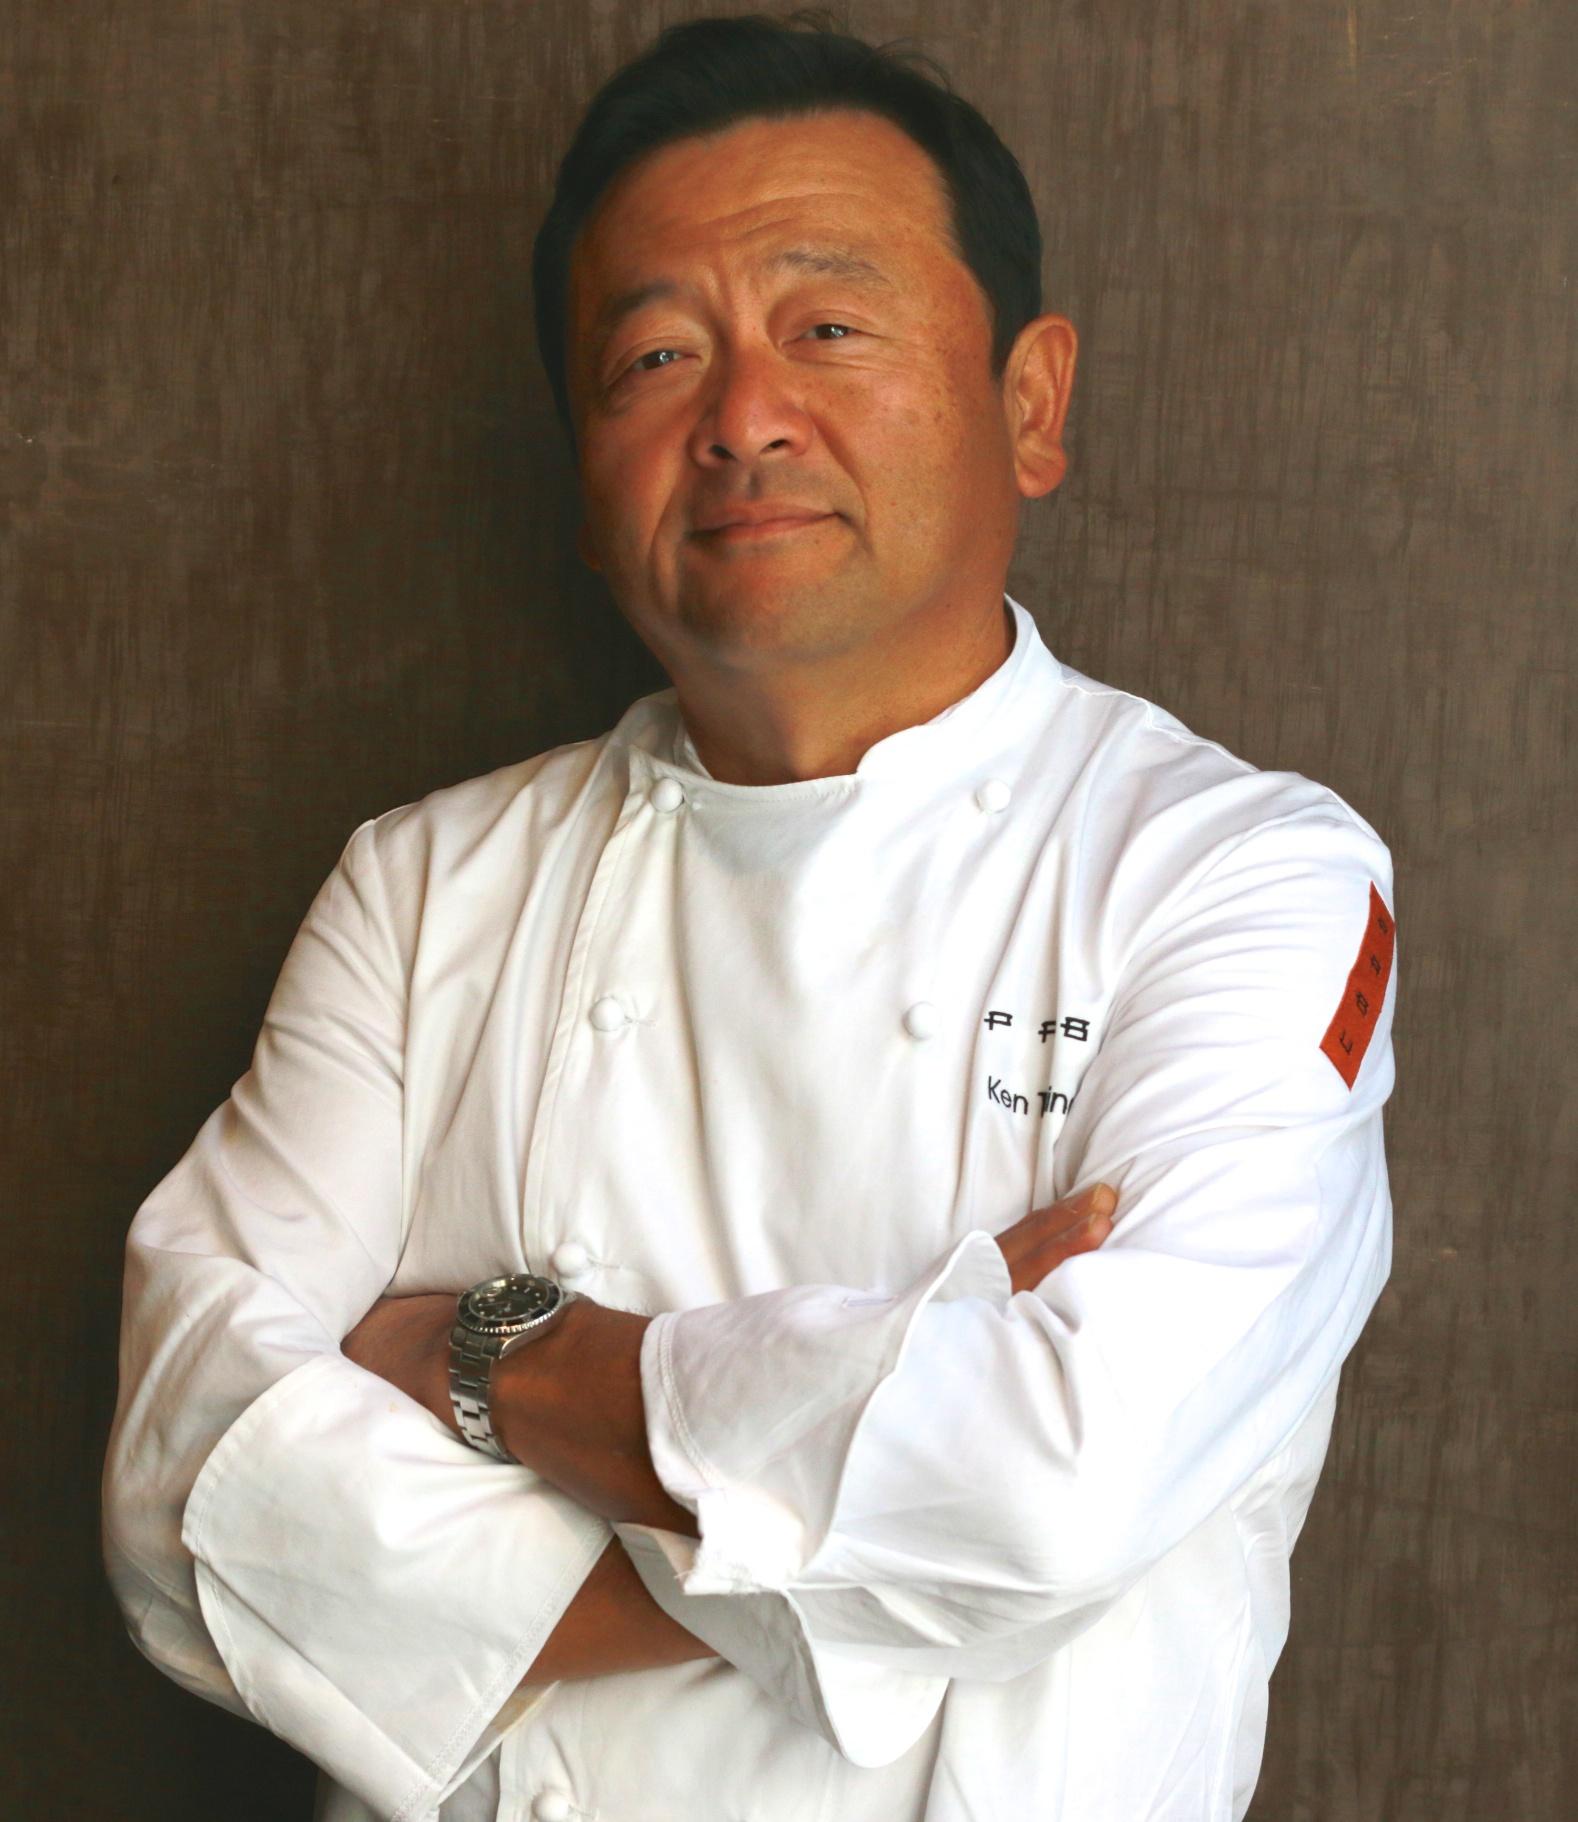 PABU - Ken Tominaga Headshot - 6.18.2014.jpg